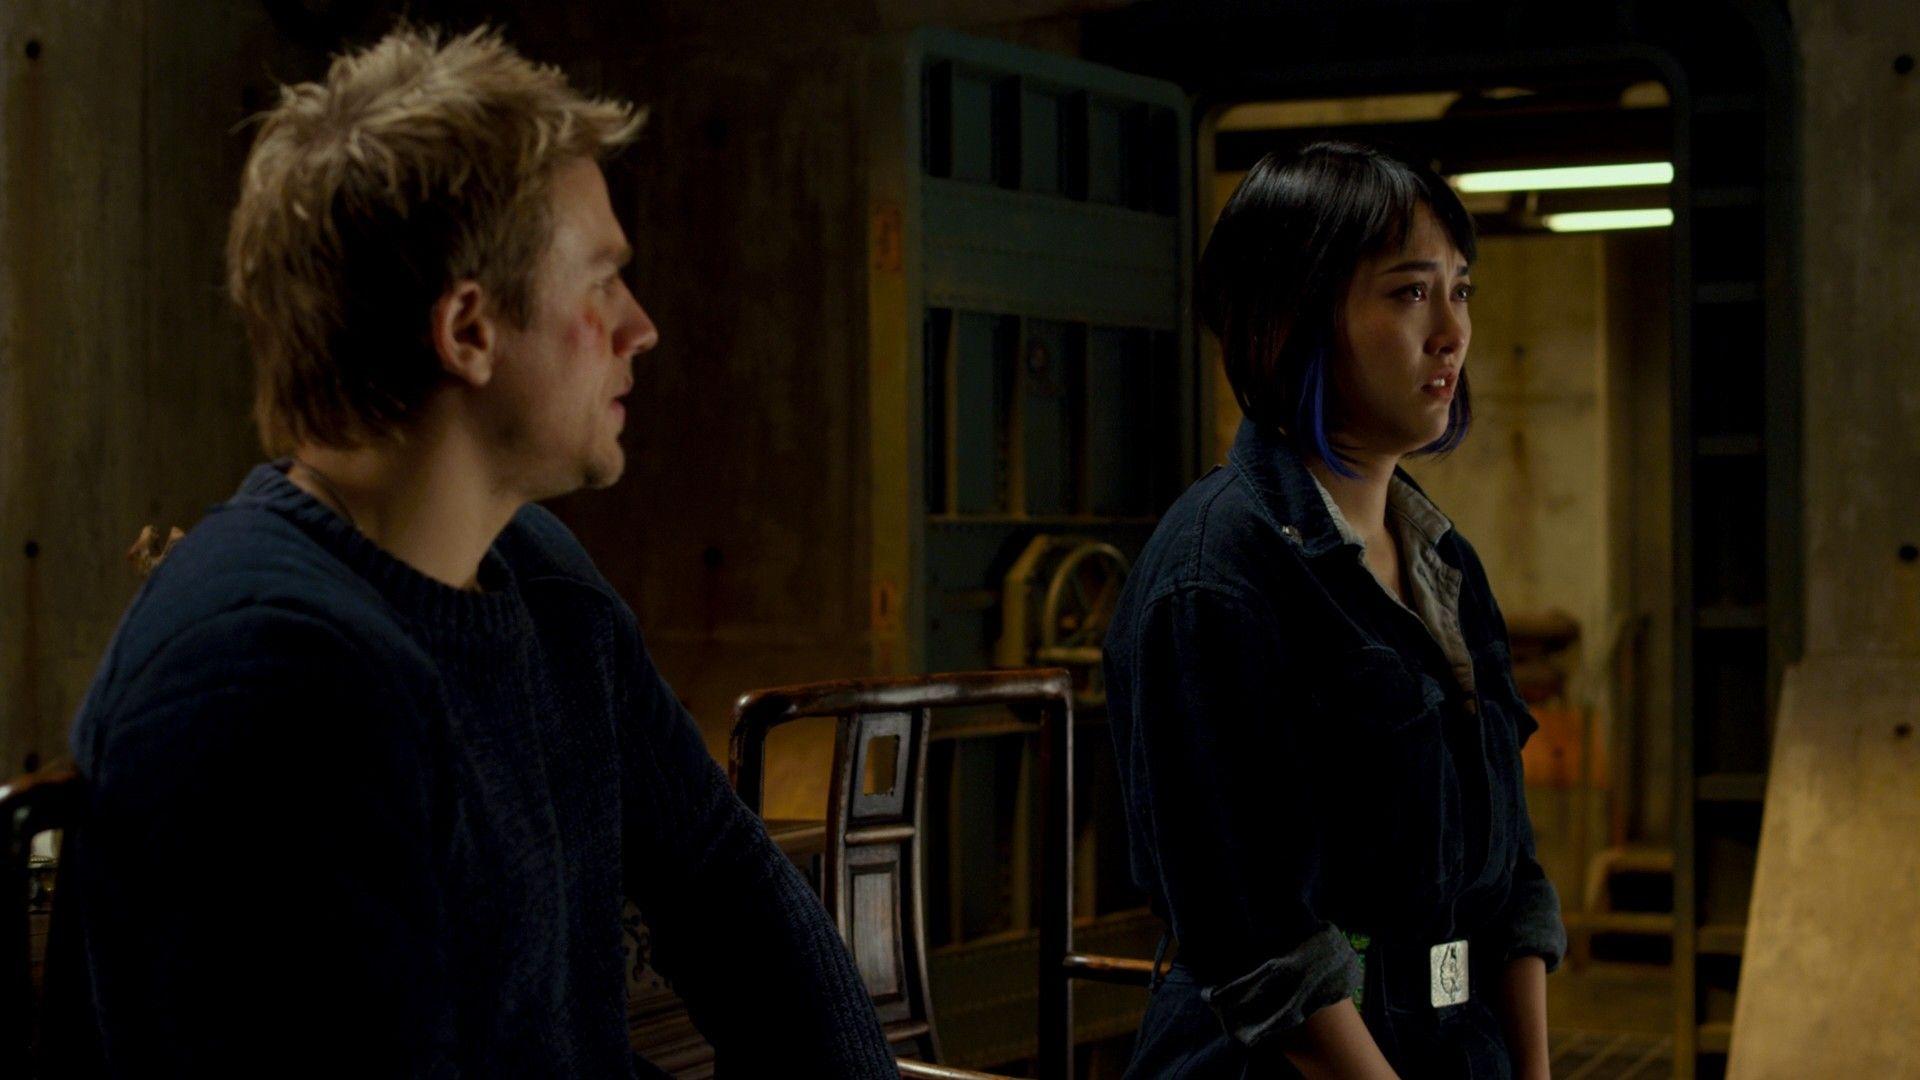 mako warns chuck to stop antagonizing raleigh.